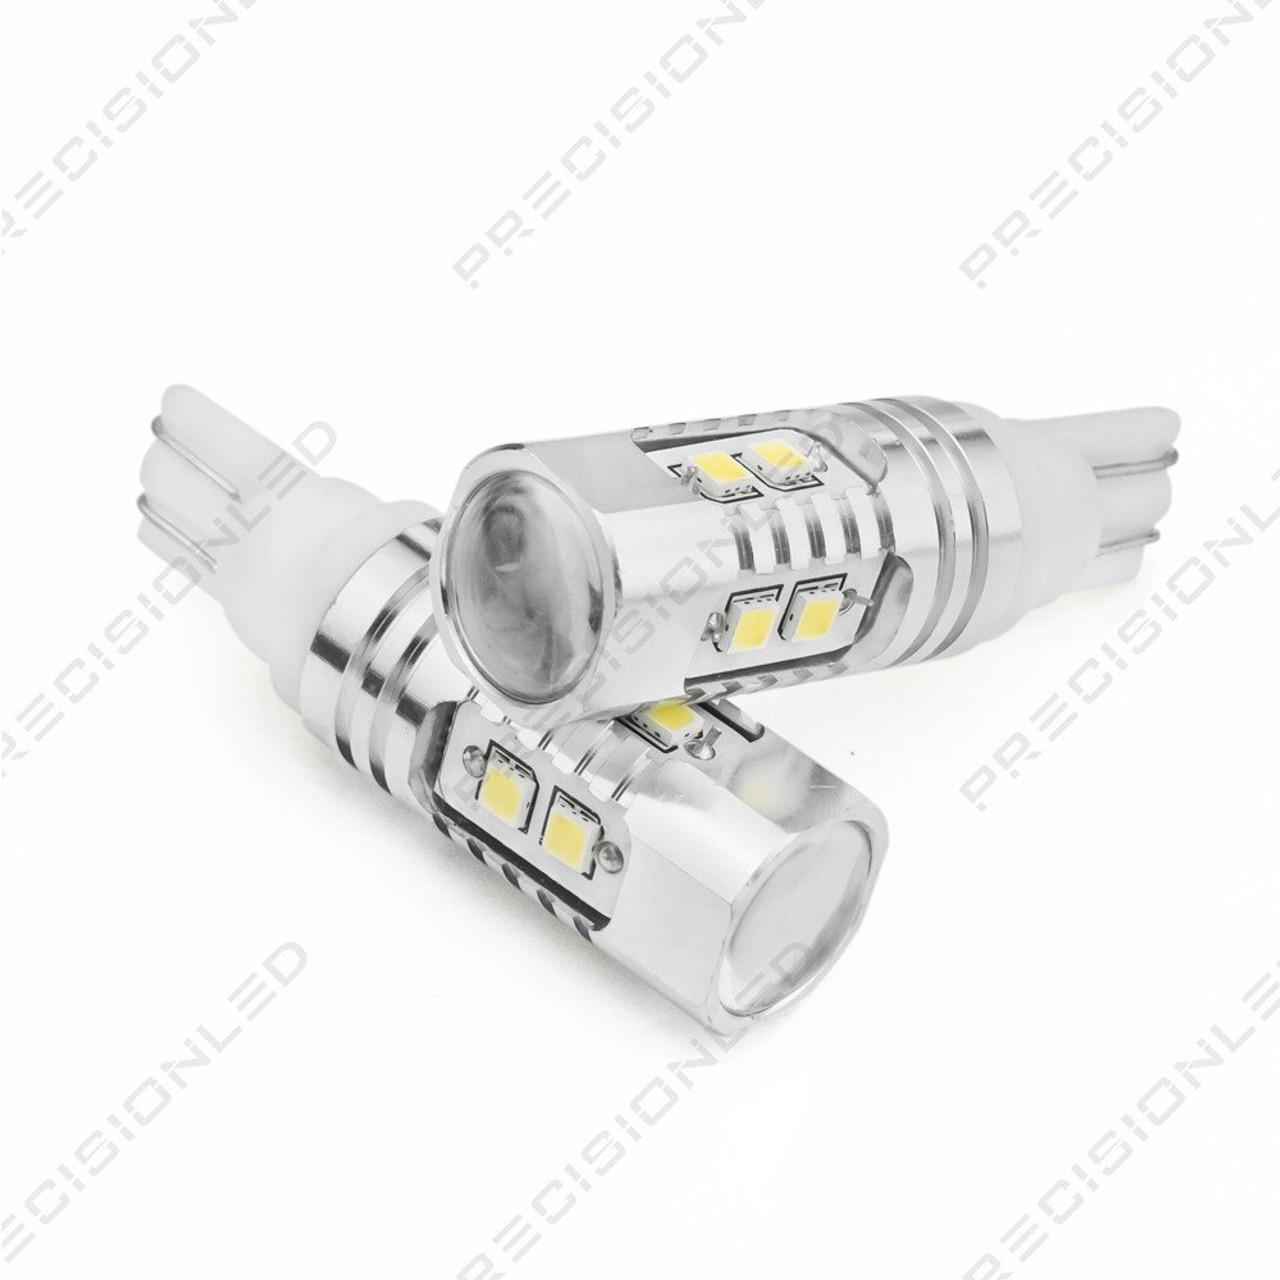 Cadillac CTS LED Backup Reverse Lights (2008-Present)